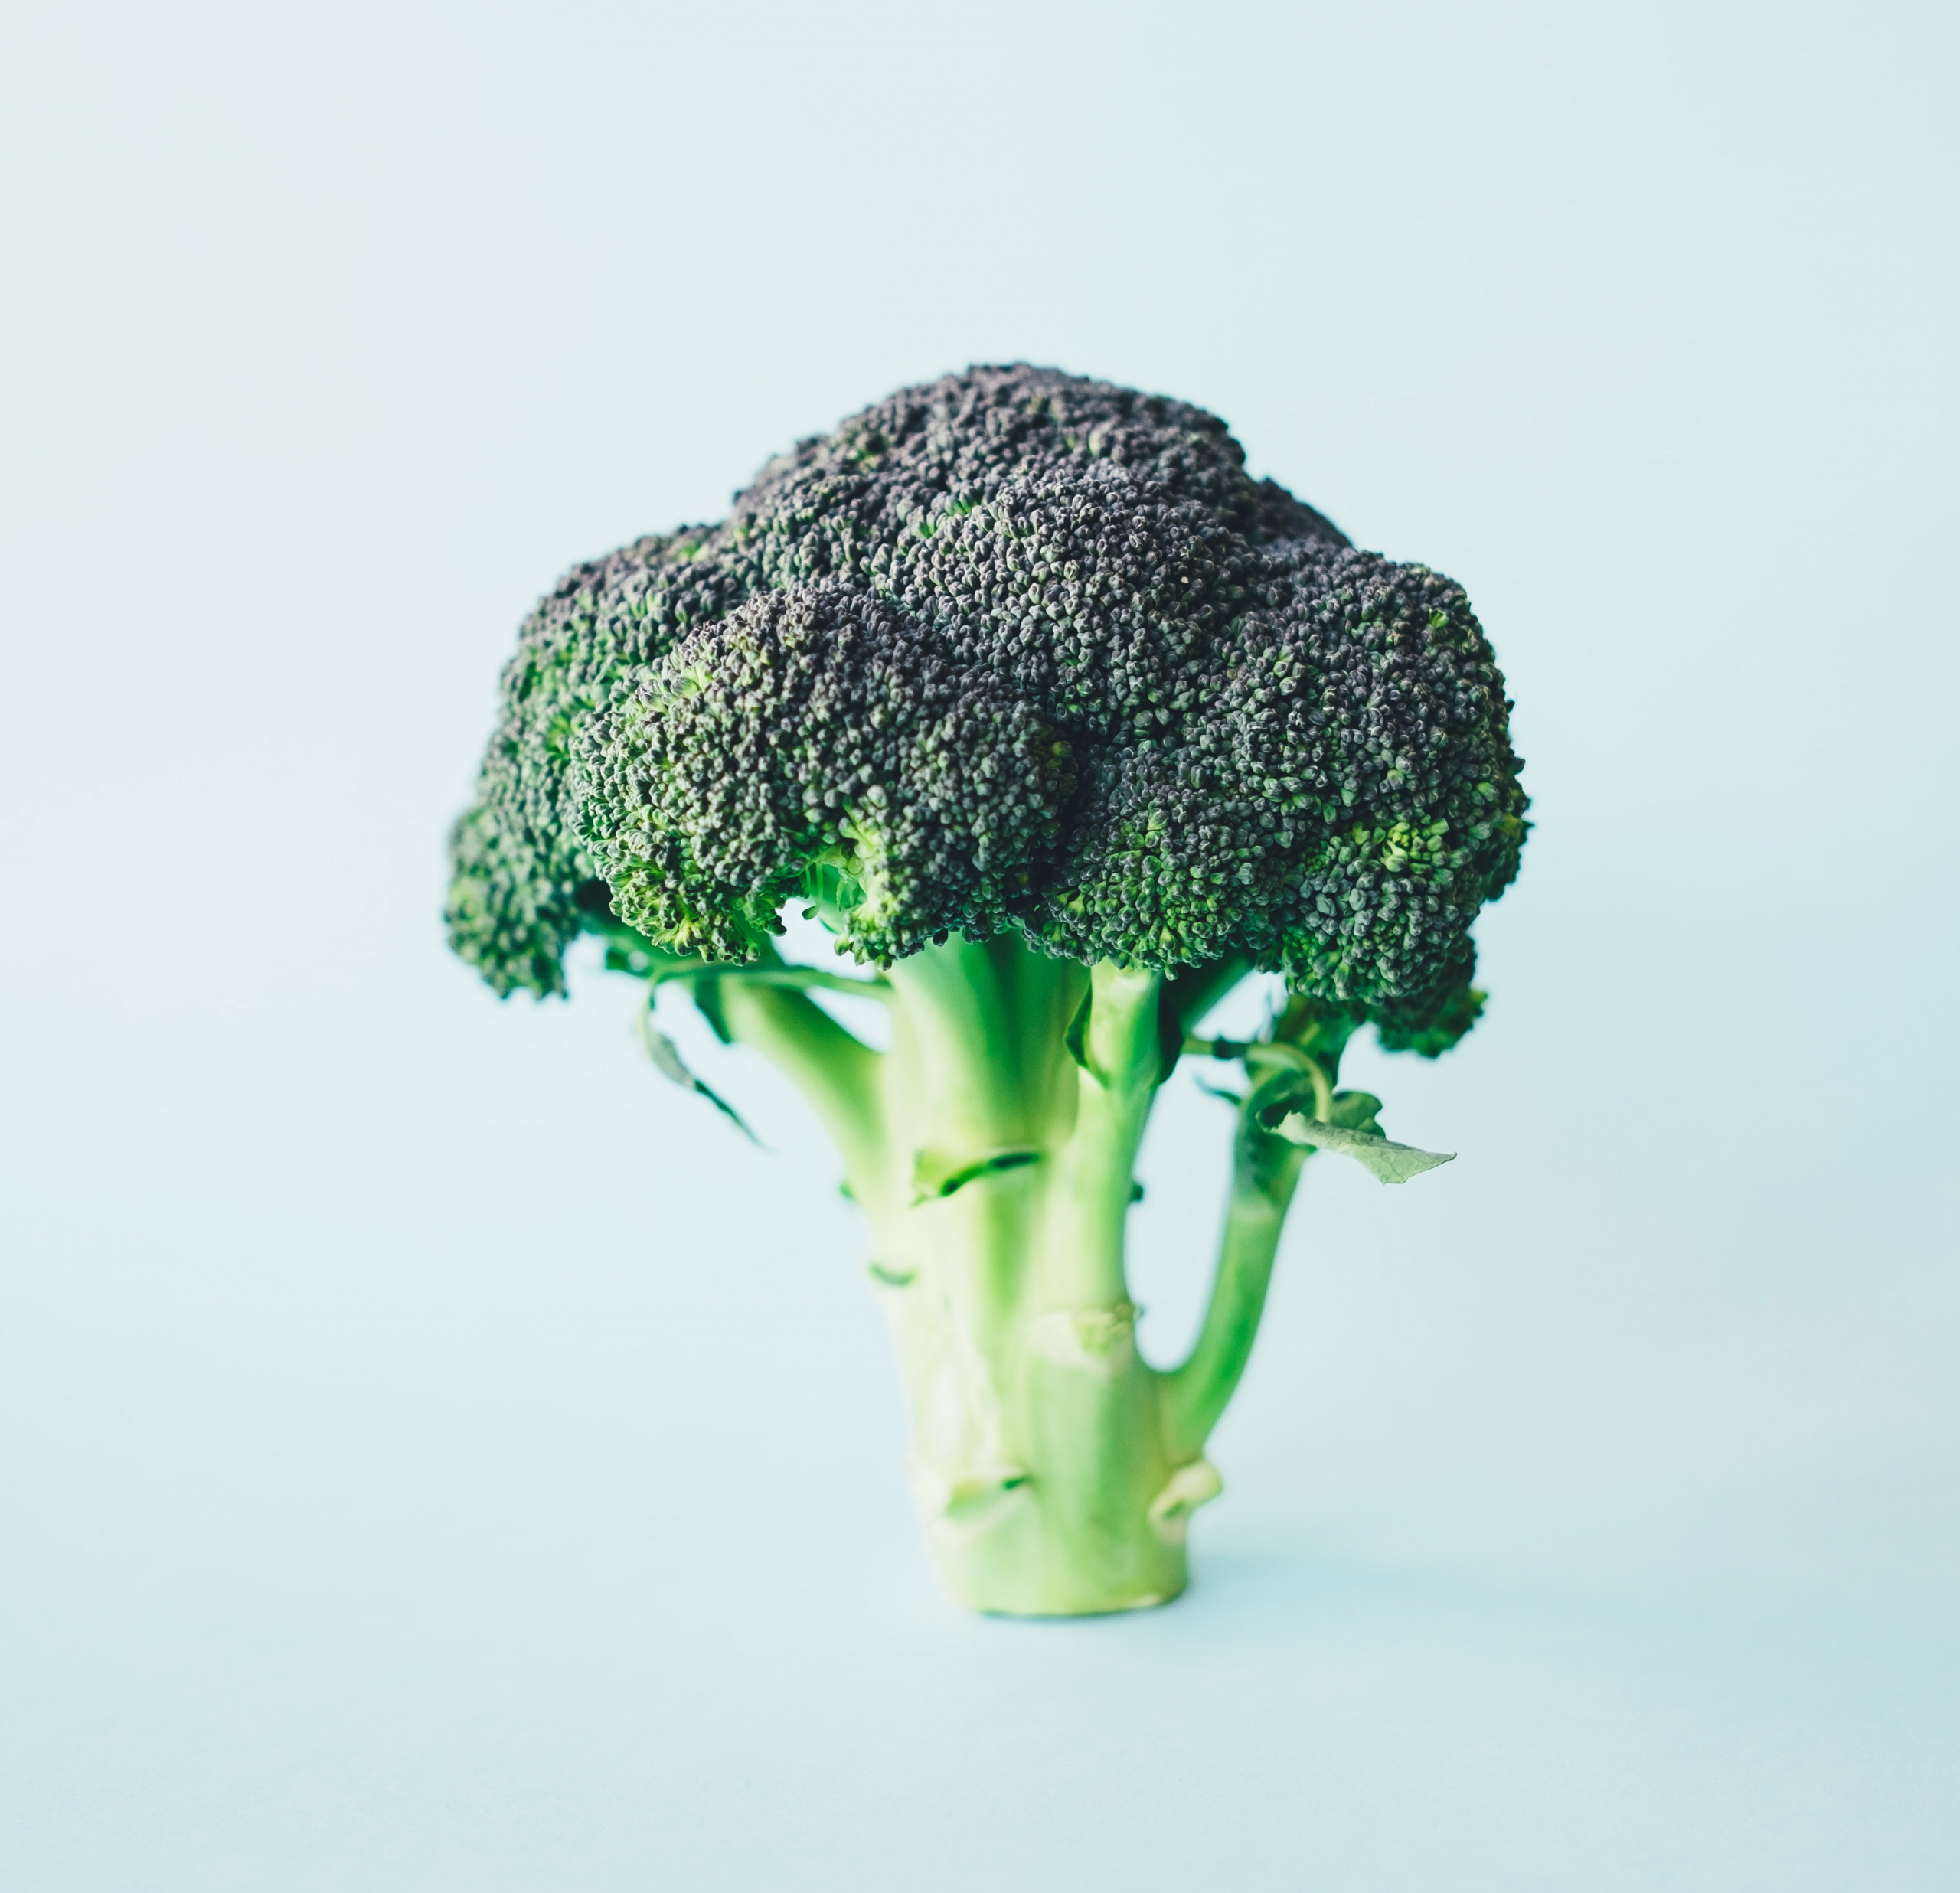 i cani possono mangiare i broccoli